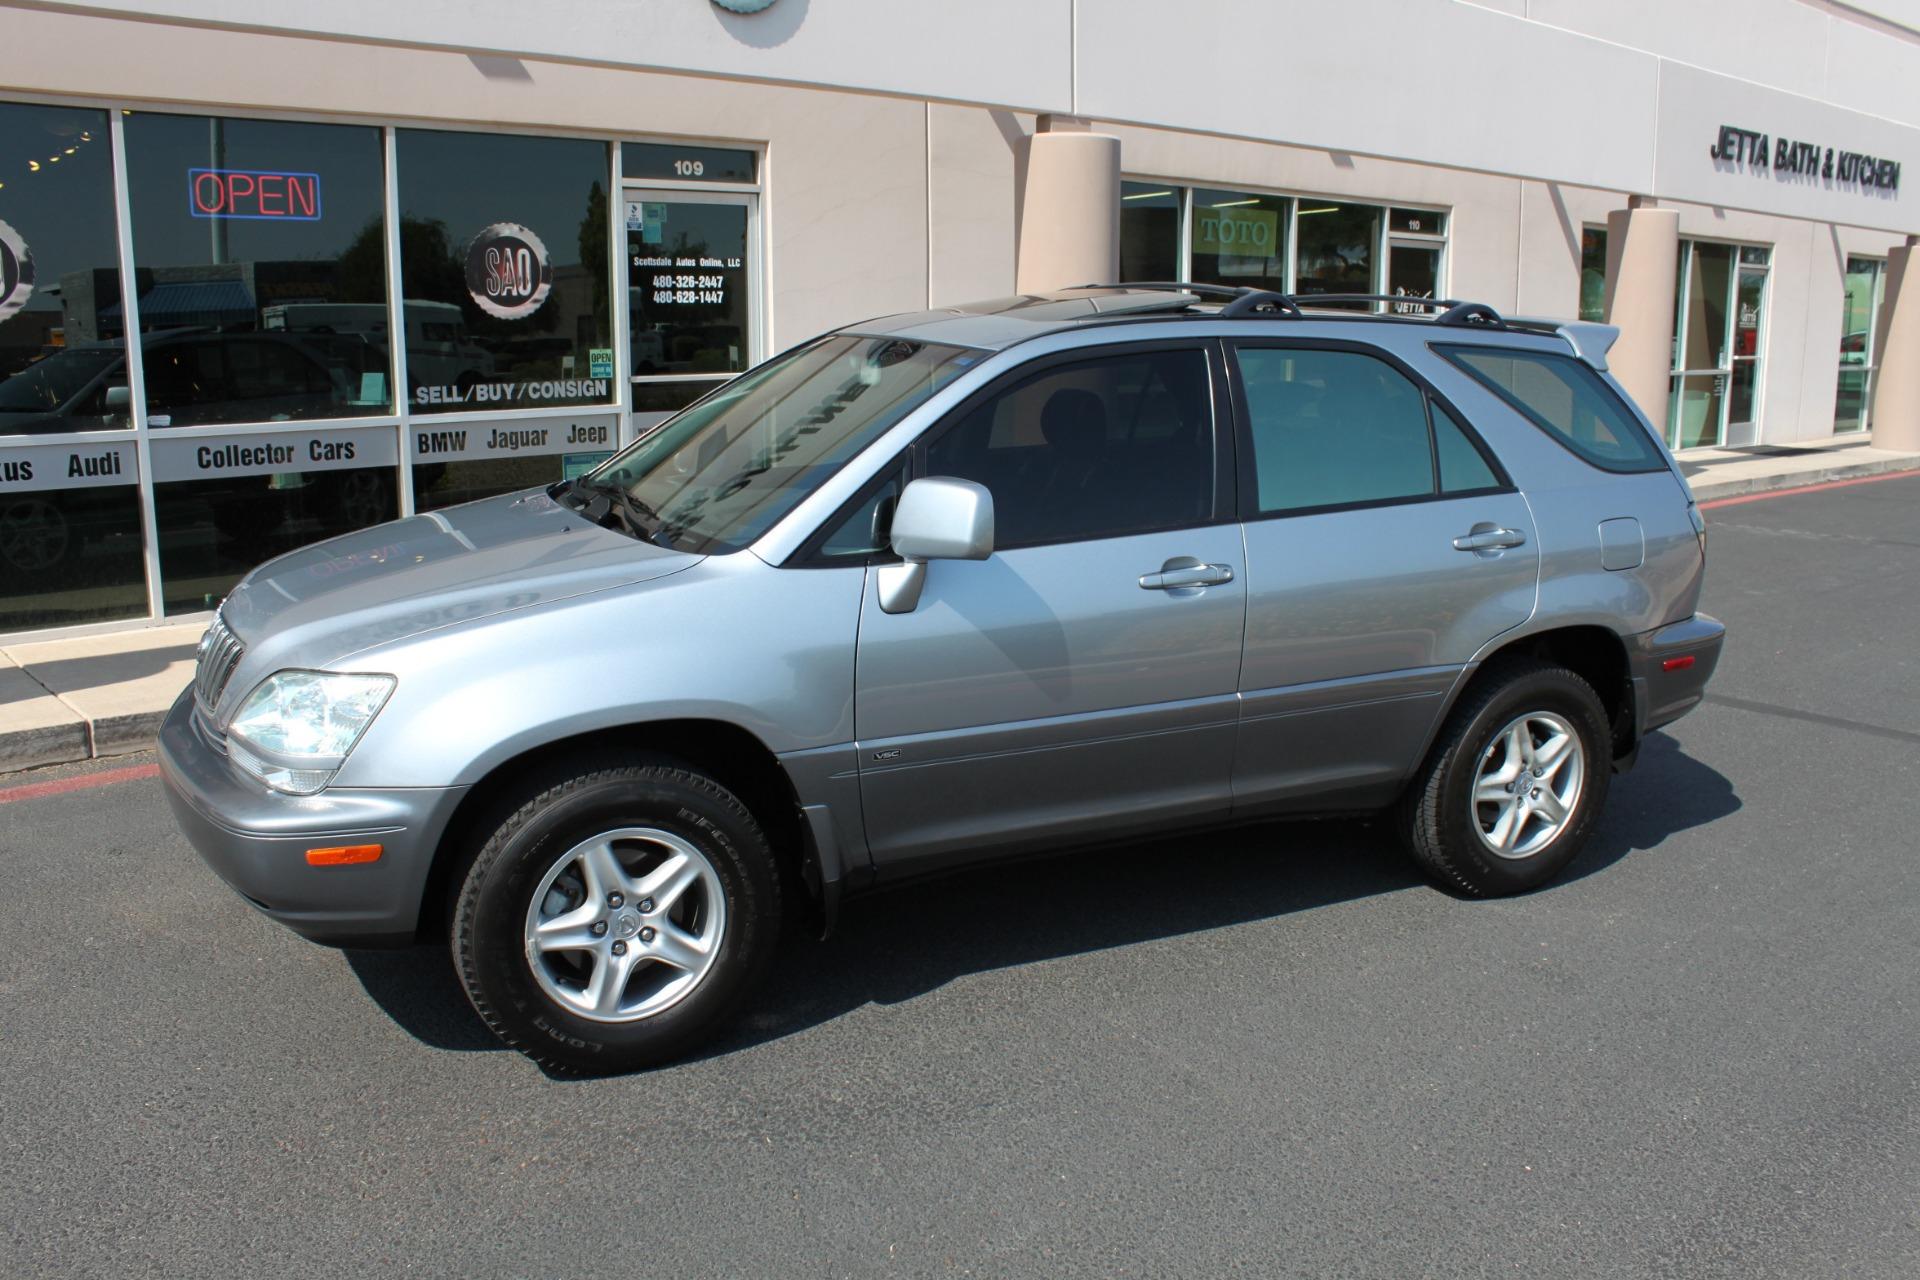 Used-2003-Lexus-RX-300-AWD-Lexus